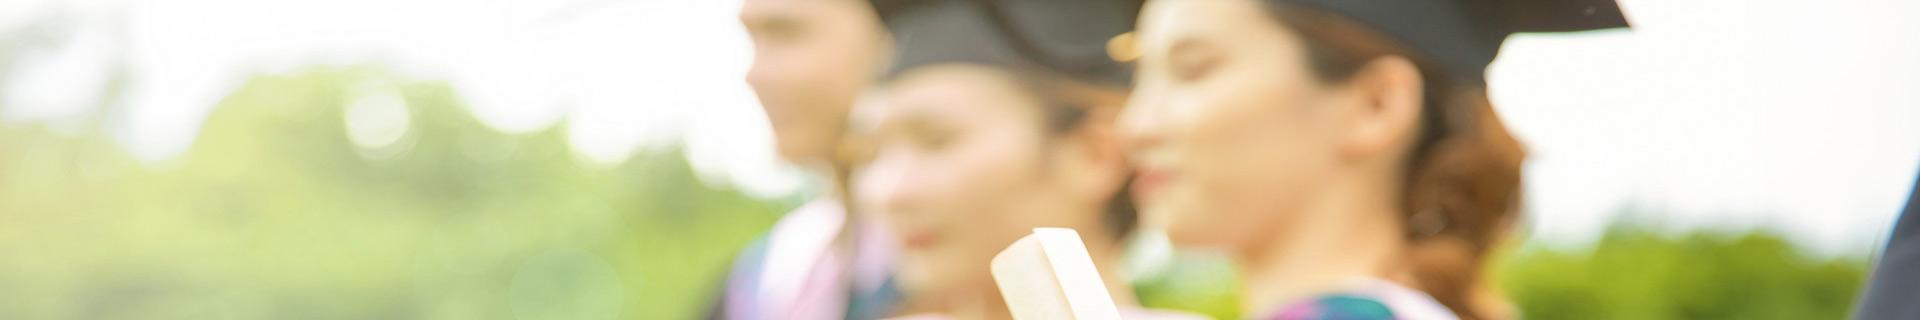 RG-UClass有课互动教学系统